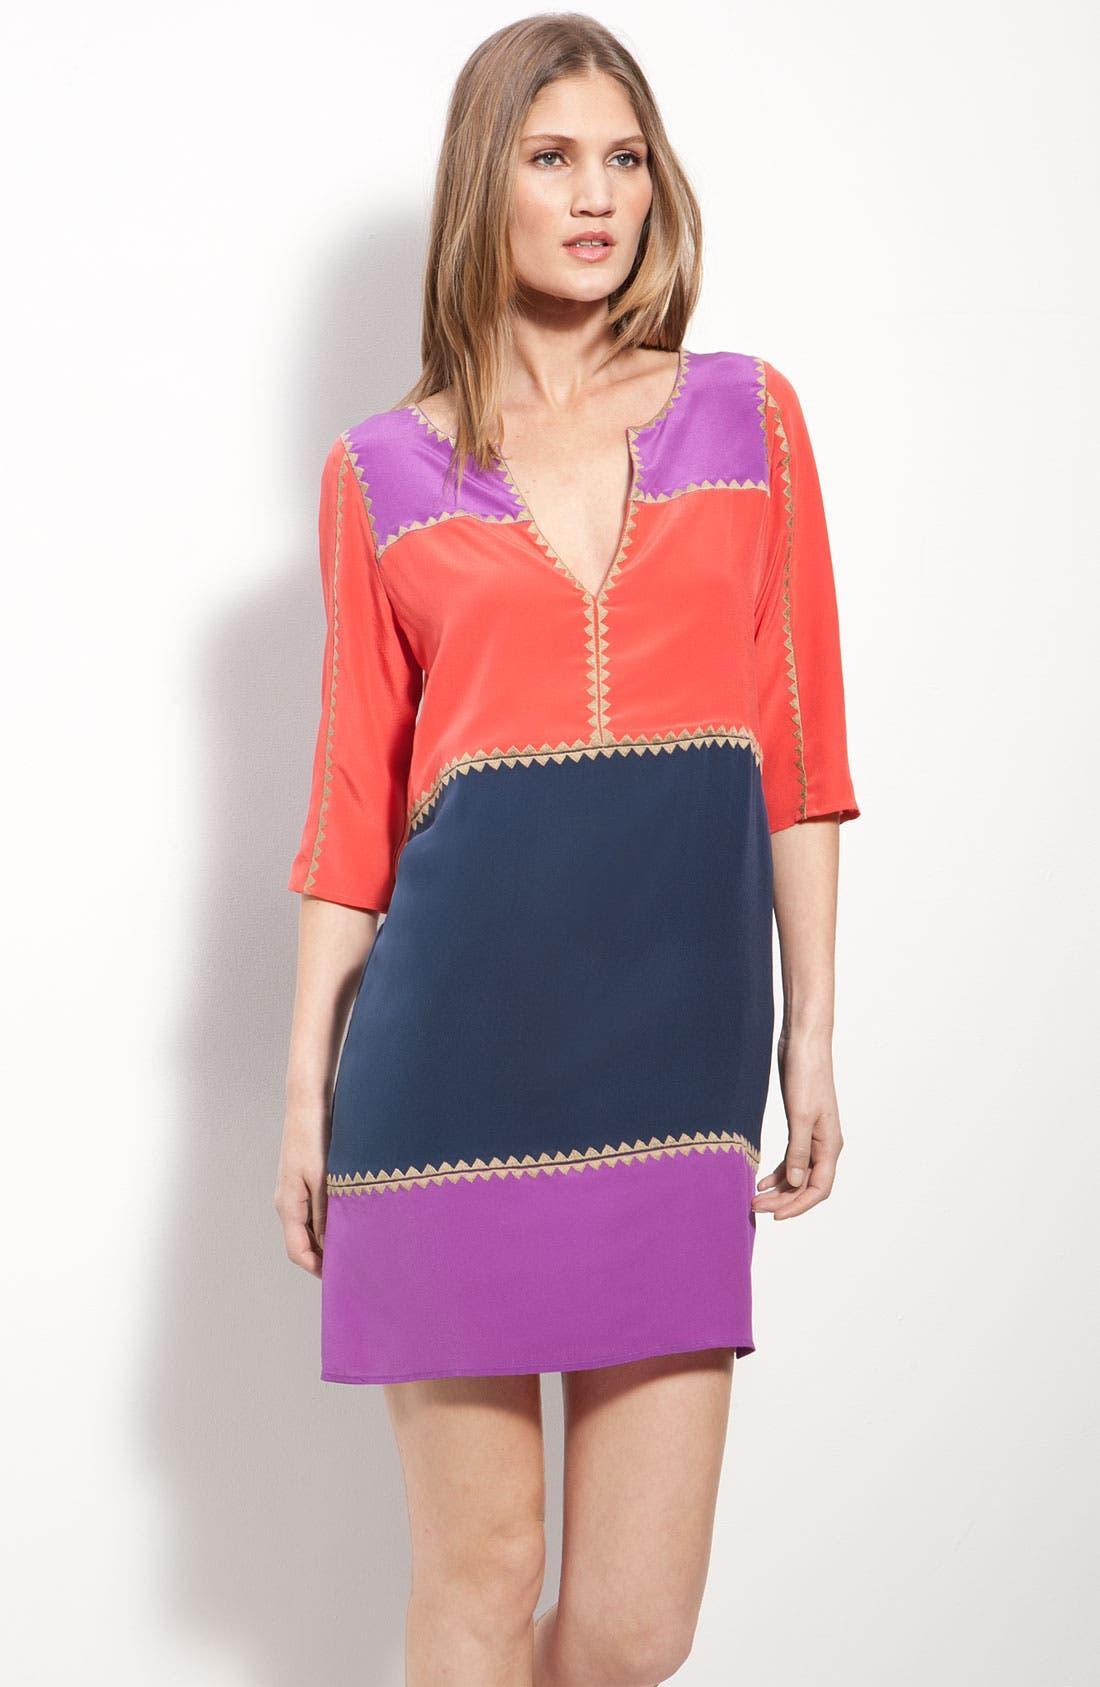 BCBGMAXAZRIA, 'Aidas' Colorblock Minidress, Main thumbnail 1, color, 695